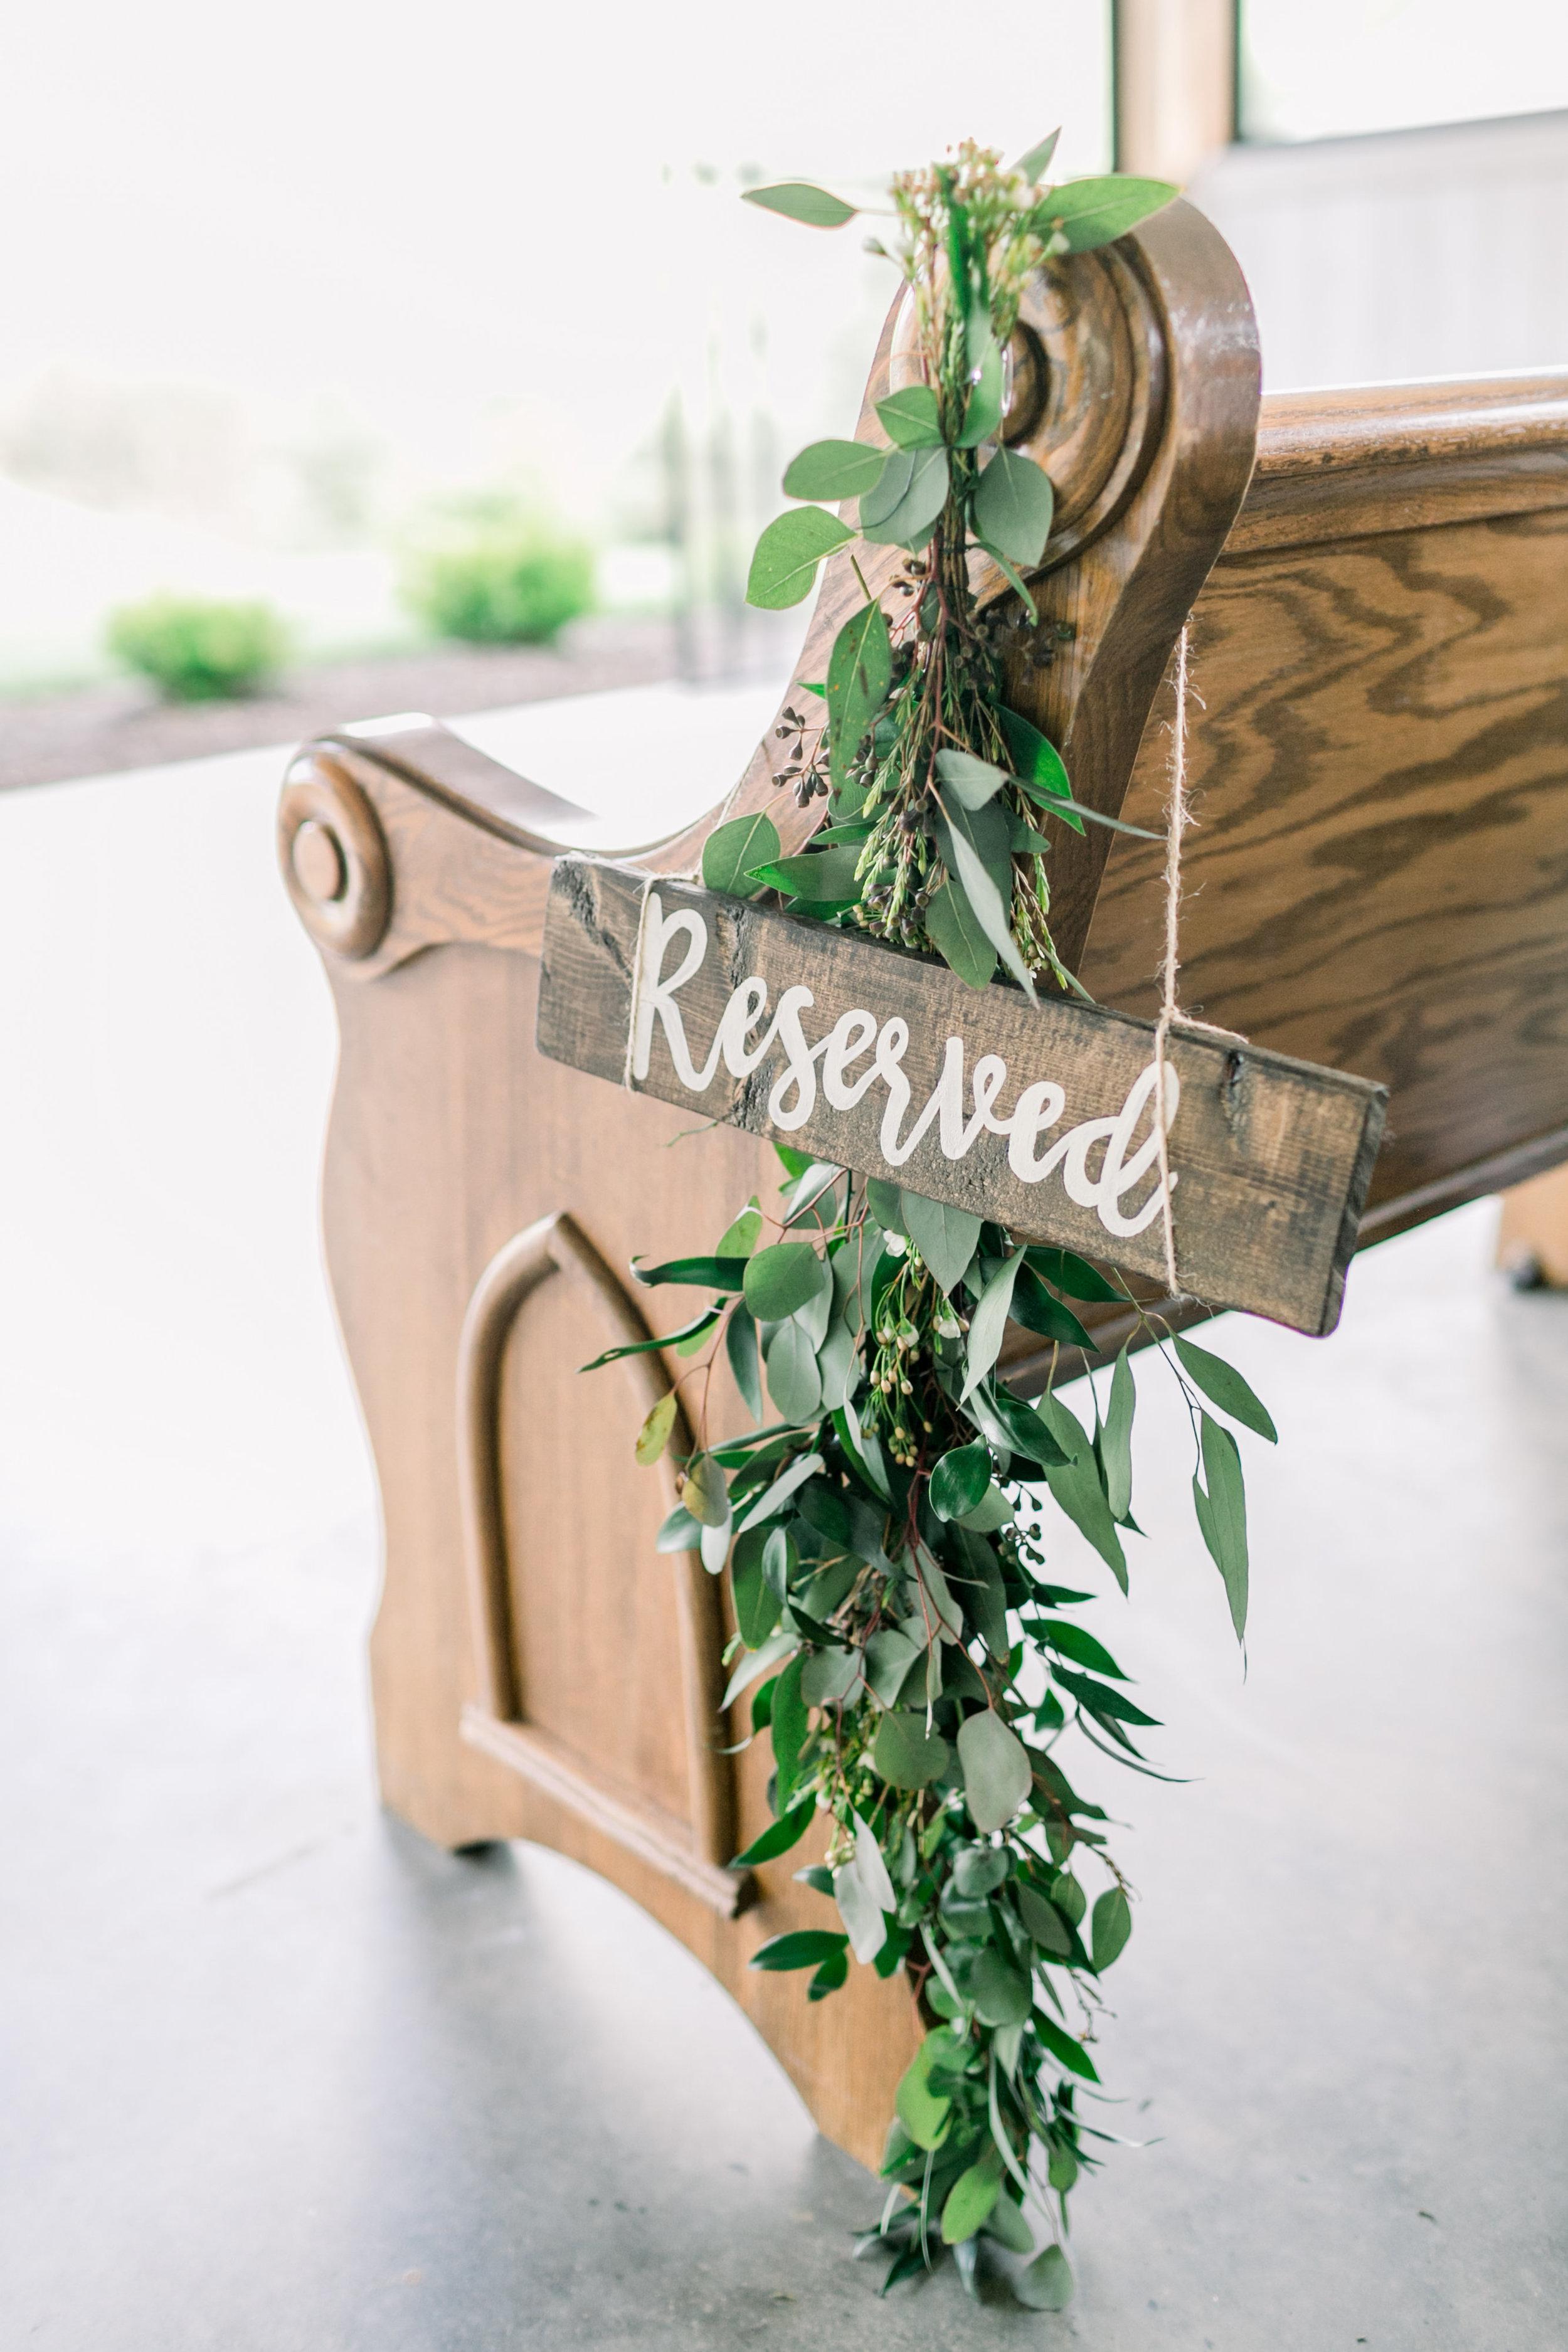 Joy-Unscripted-Wedding-Calligraphy-Kendall-23.jpg